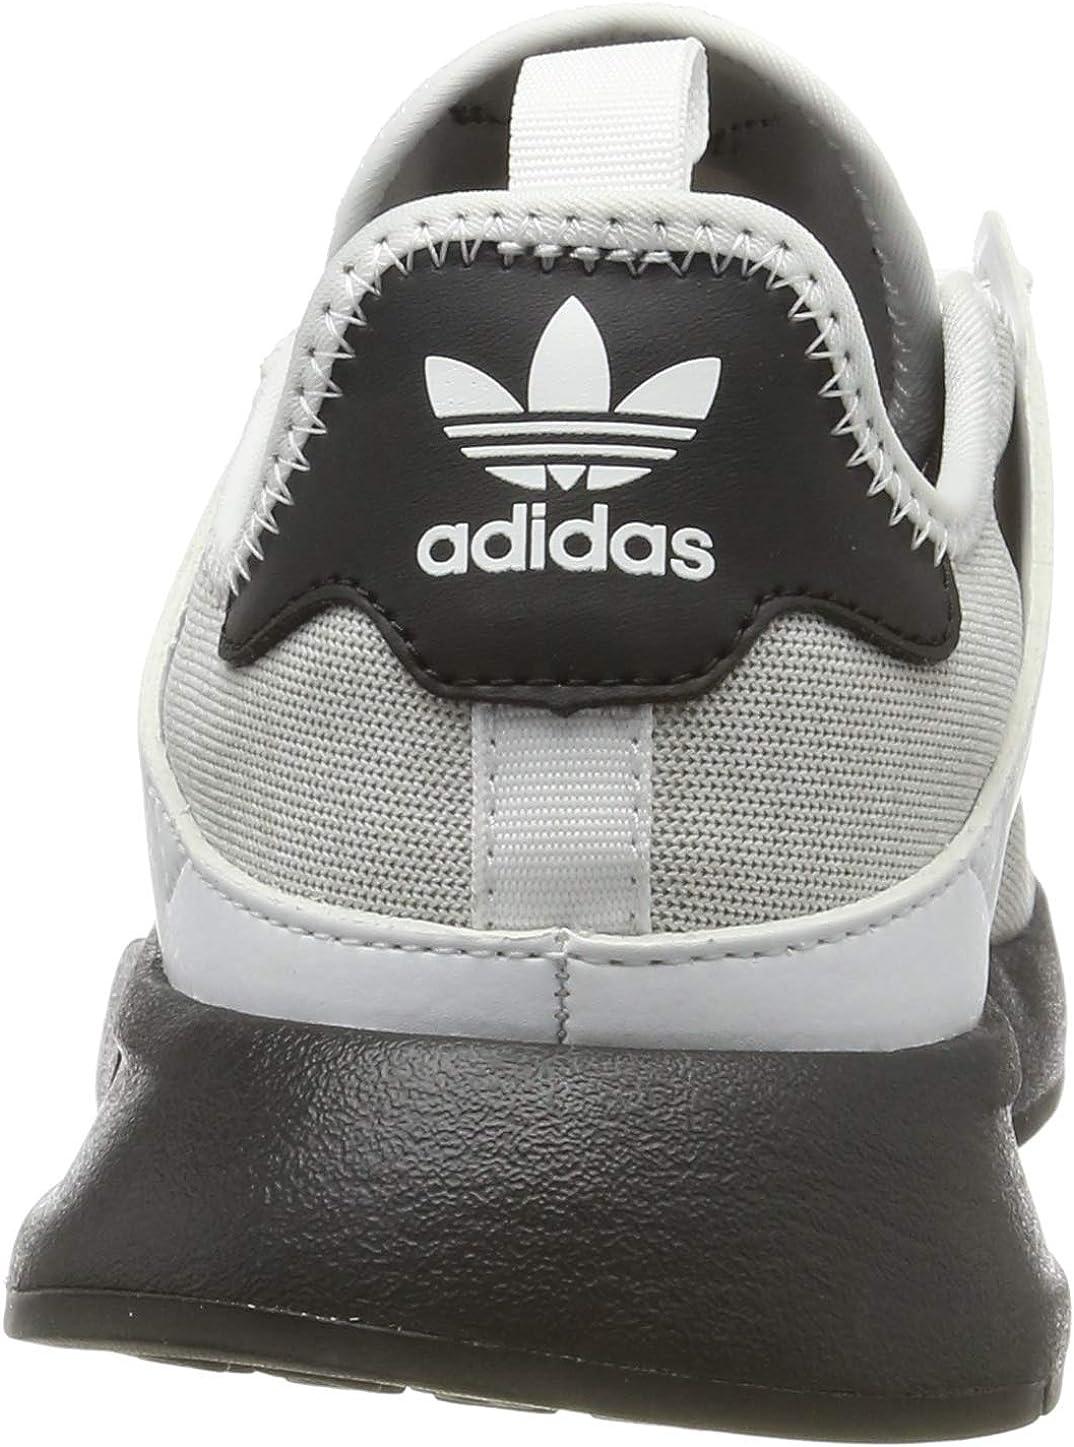 Adidas X PLR J Basket Mode Garçon Gris Light Grey Heather Core Black Ftwr White Light Grey Heather Core Black Ftwr White